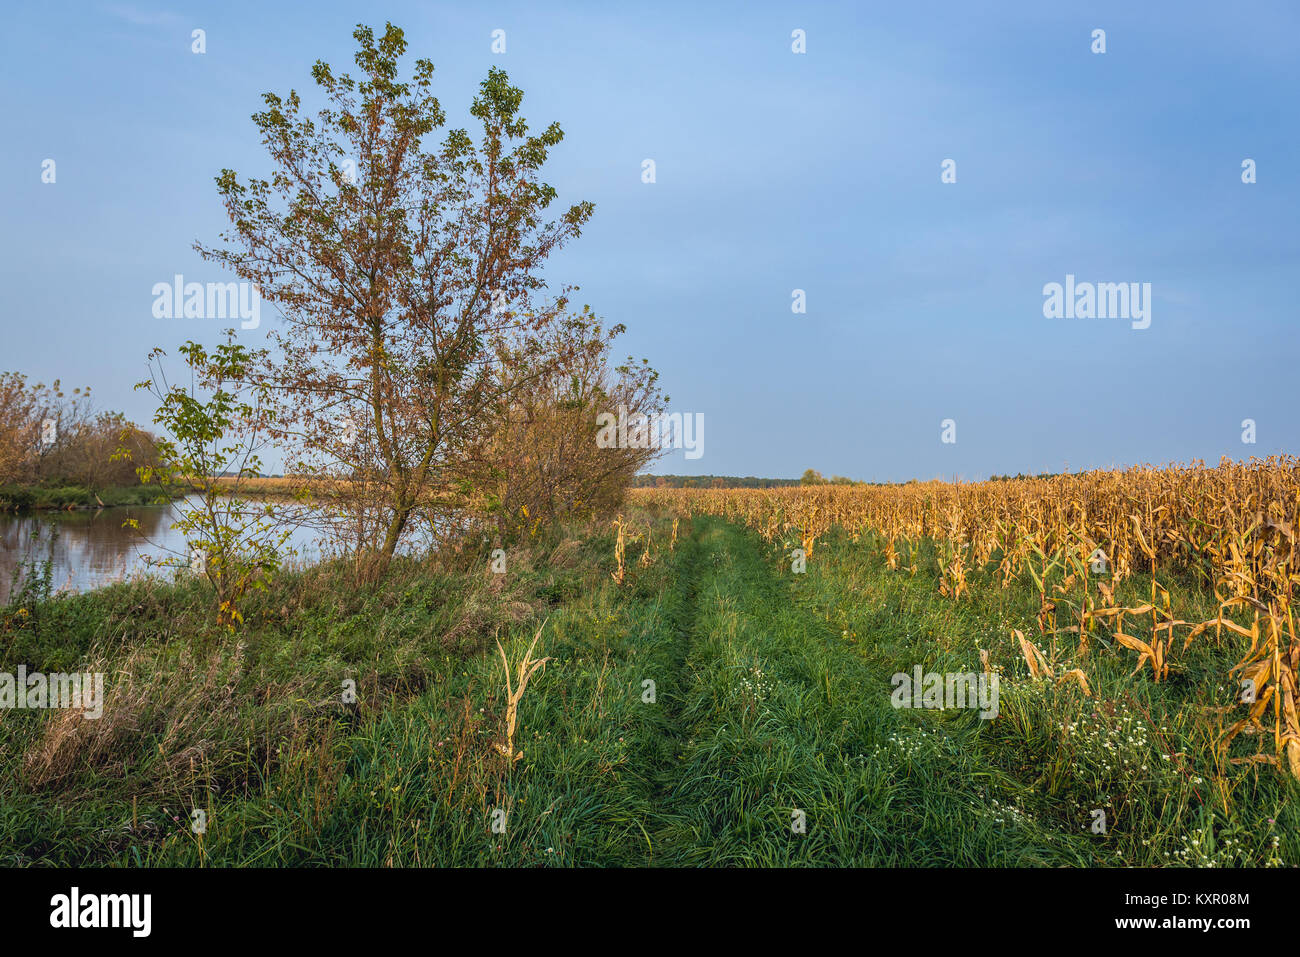 Corn fields over Bzura River in Witkowice village, Sochaczew County in Masovian Voivodeship of Poland - Stock Image